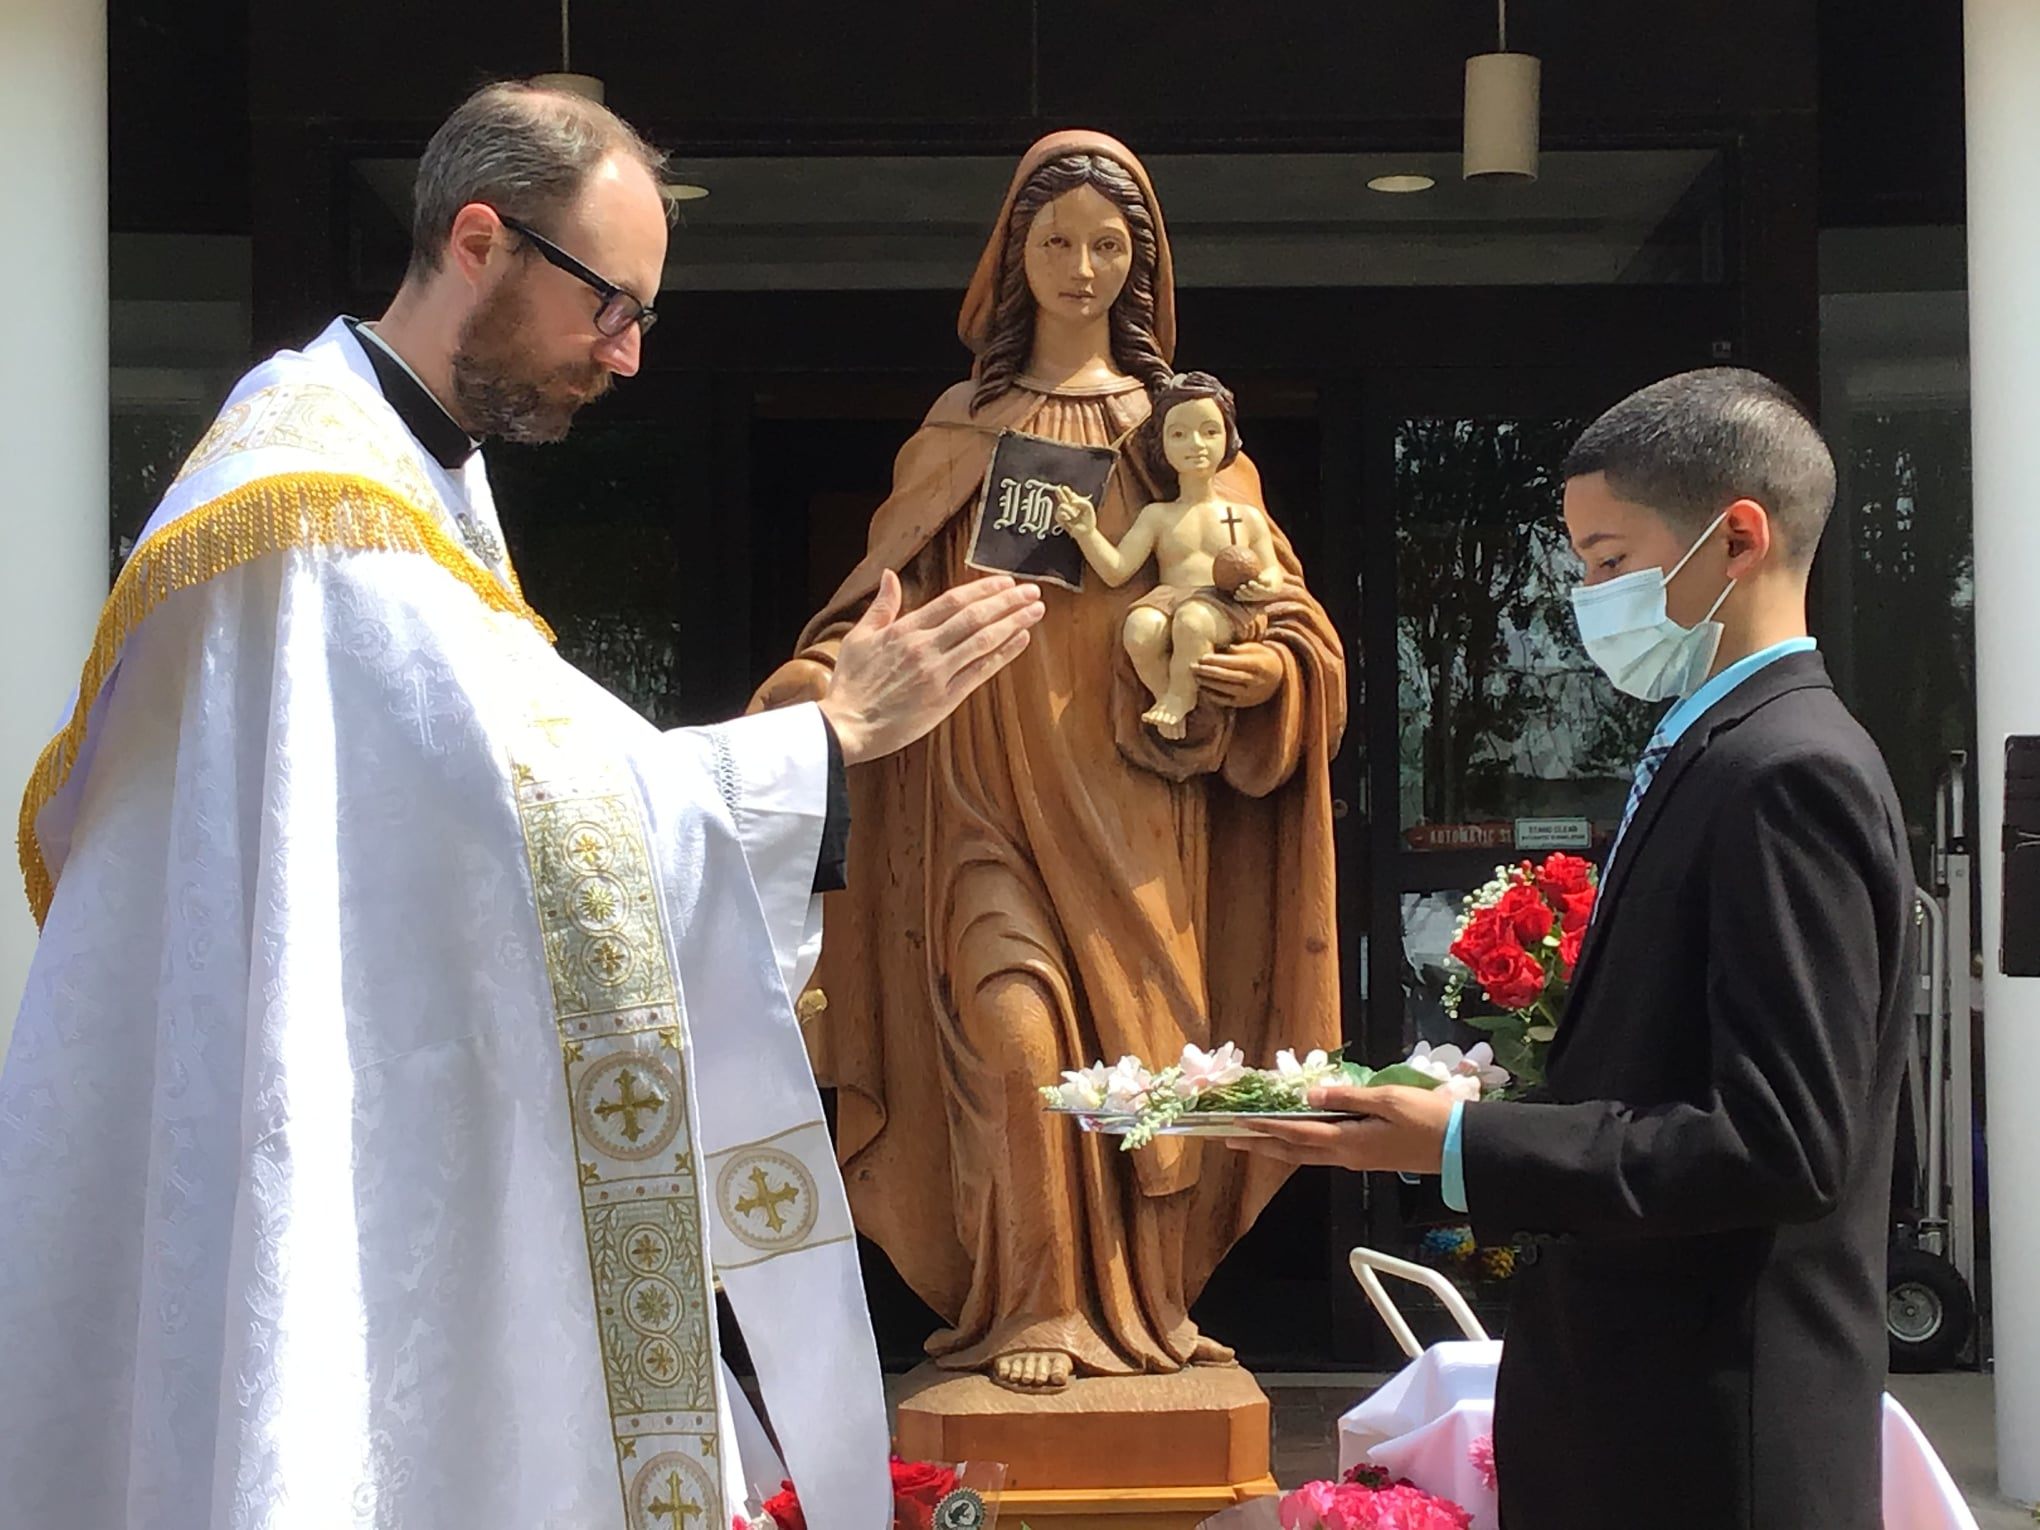 Parish Partner Spotlight: Our Lady of Mount Carmel